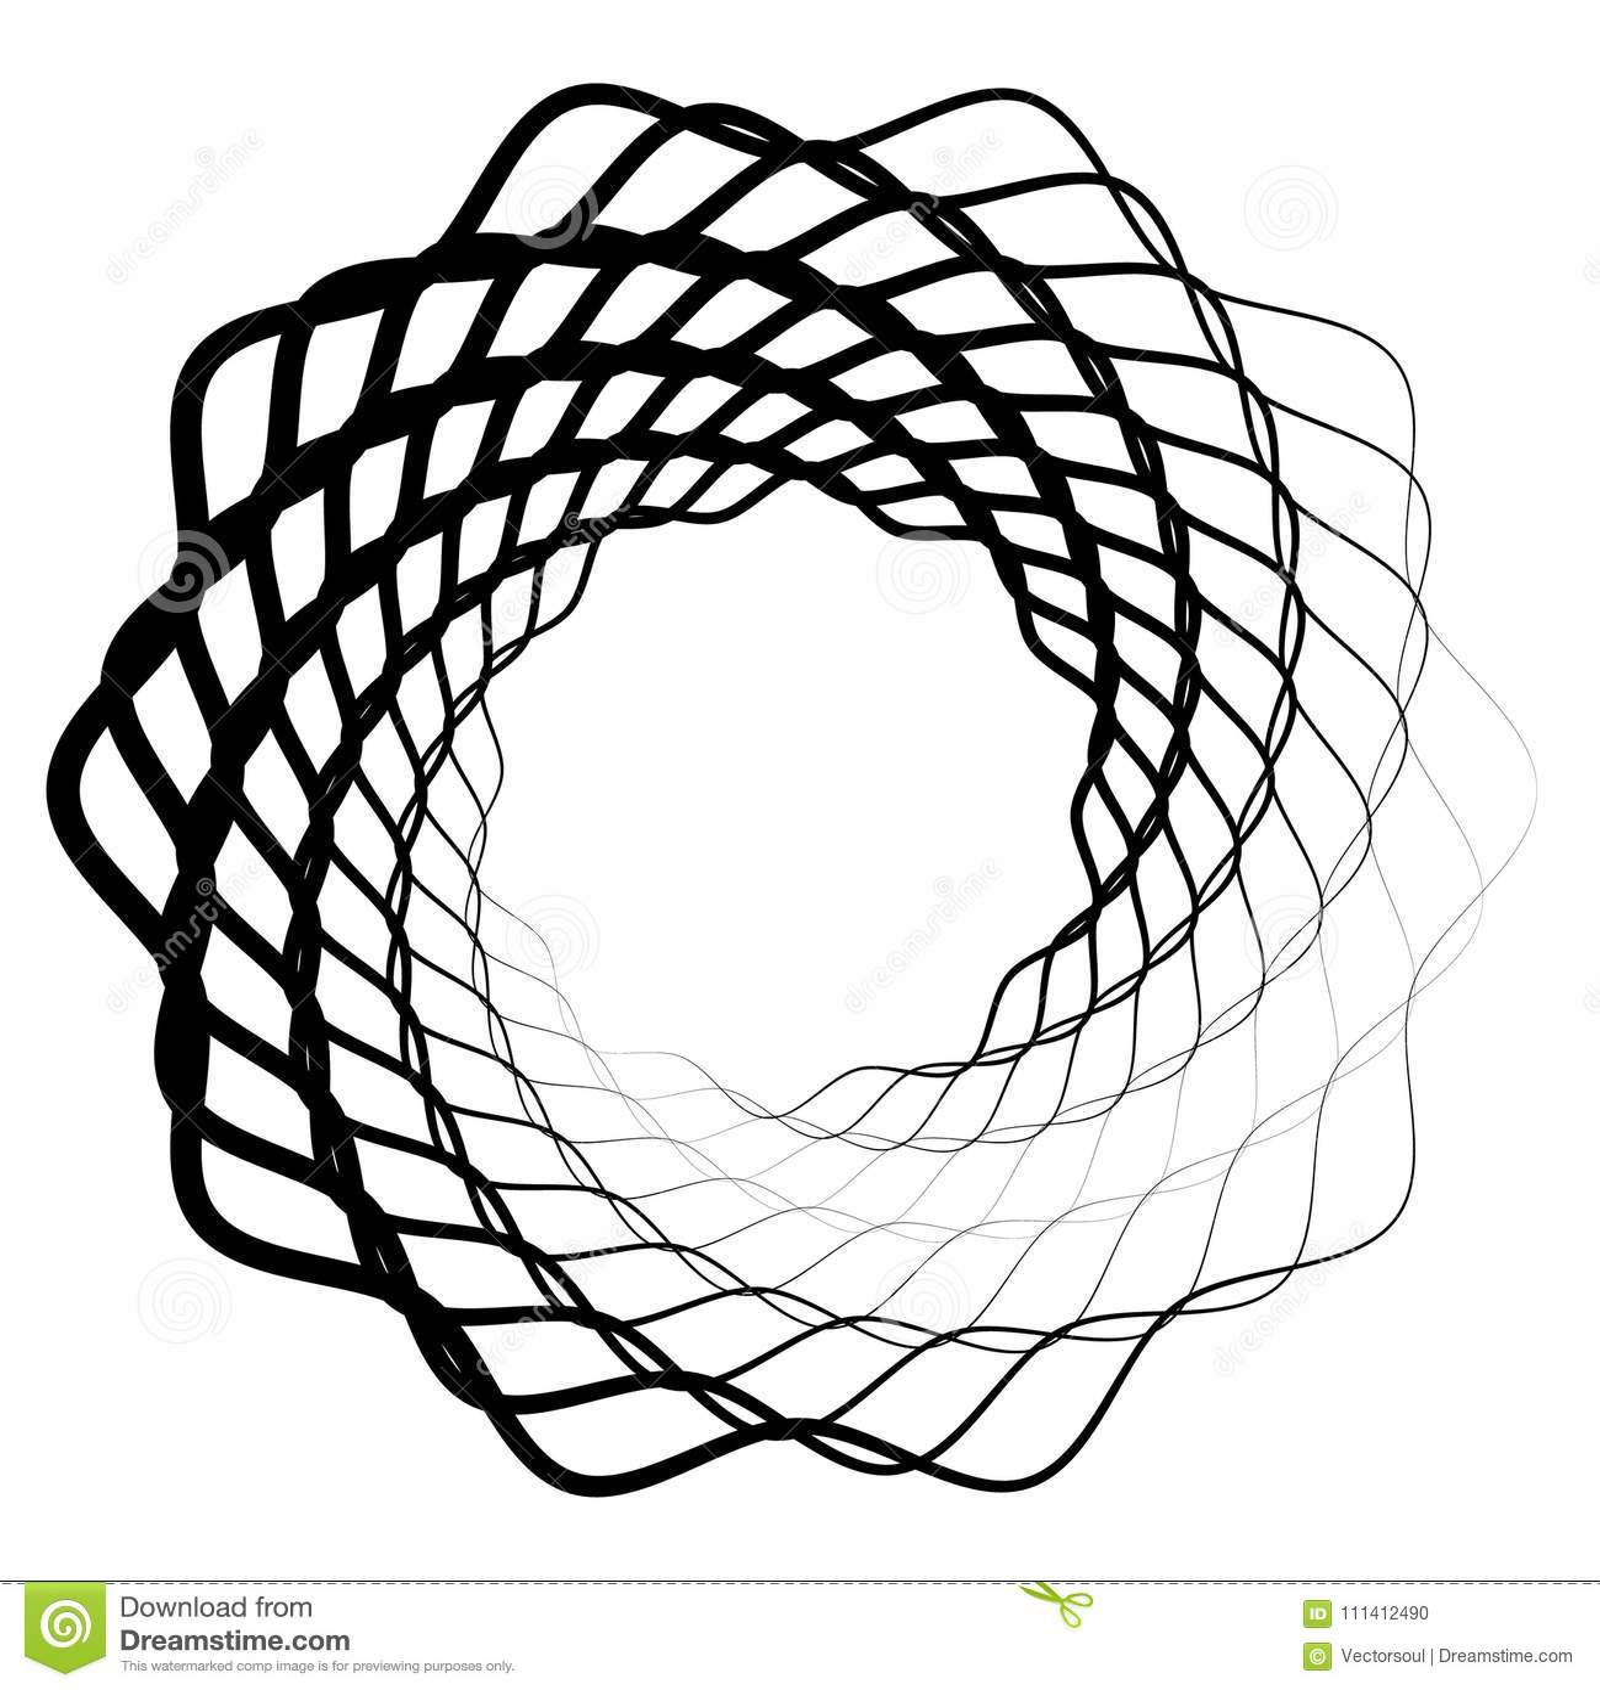 Mandala, Motif With Wavy, Zig-zag Lines Rotating Stock